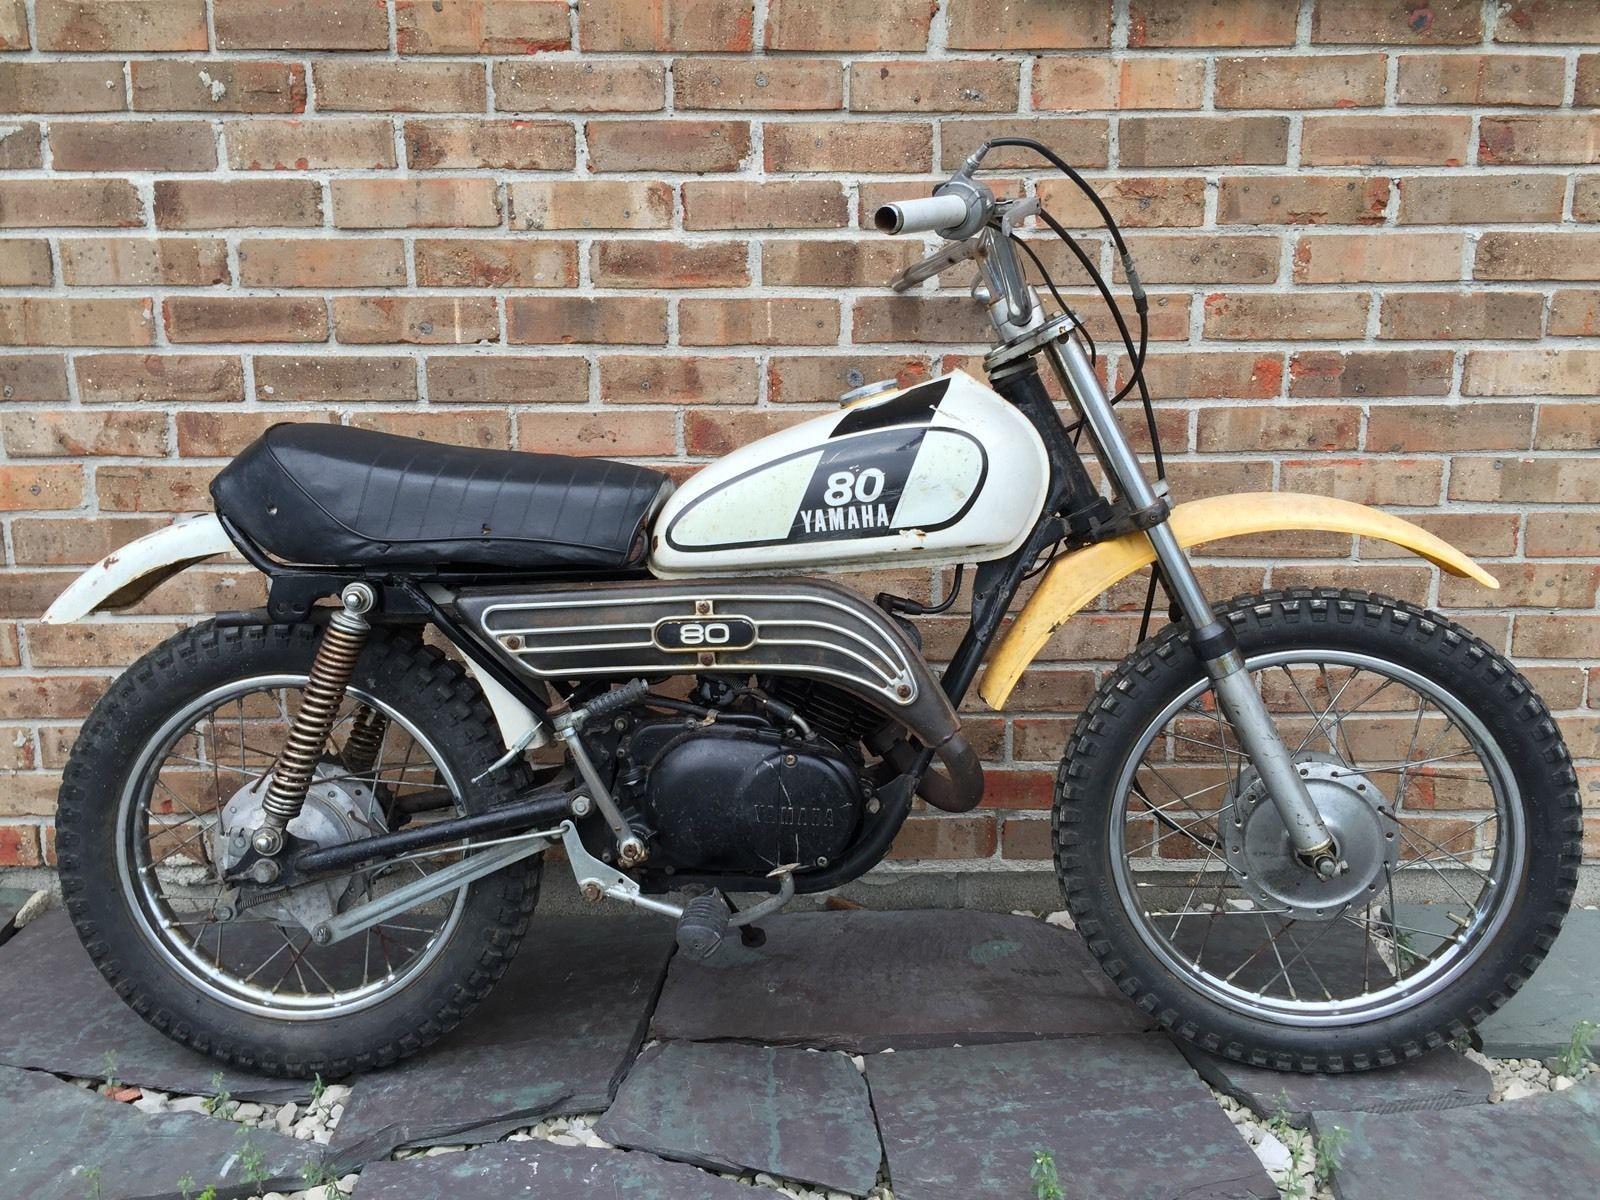 Vintage 1974 Yamaha GT 80 MX Mini Dirt Bike for Parts Restoration Display |  eBay